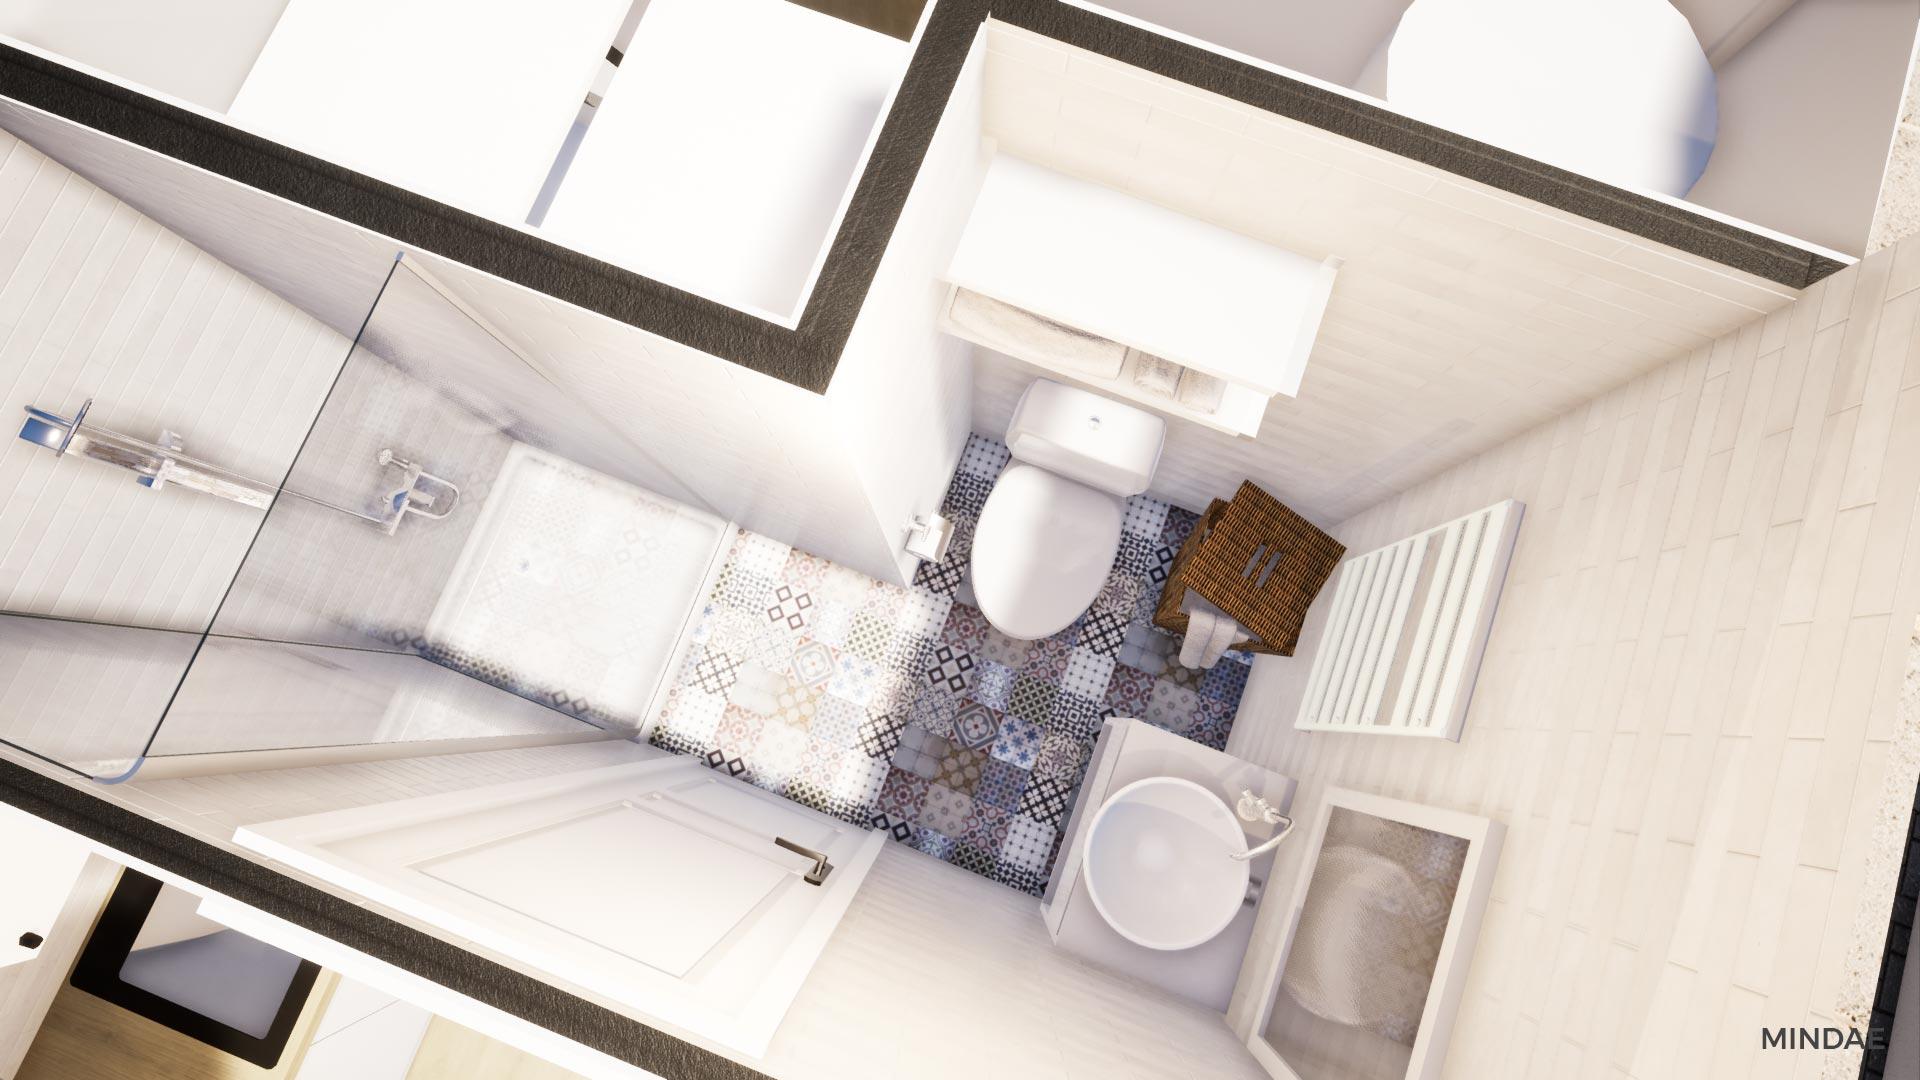 Mindae_3D_as_immobilier_projet_A_garage_duplex_studio_investisseur_caen-(9)